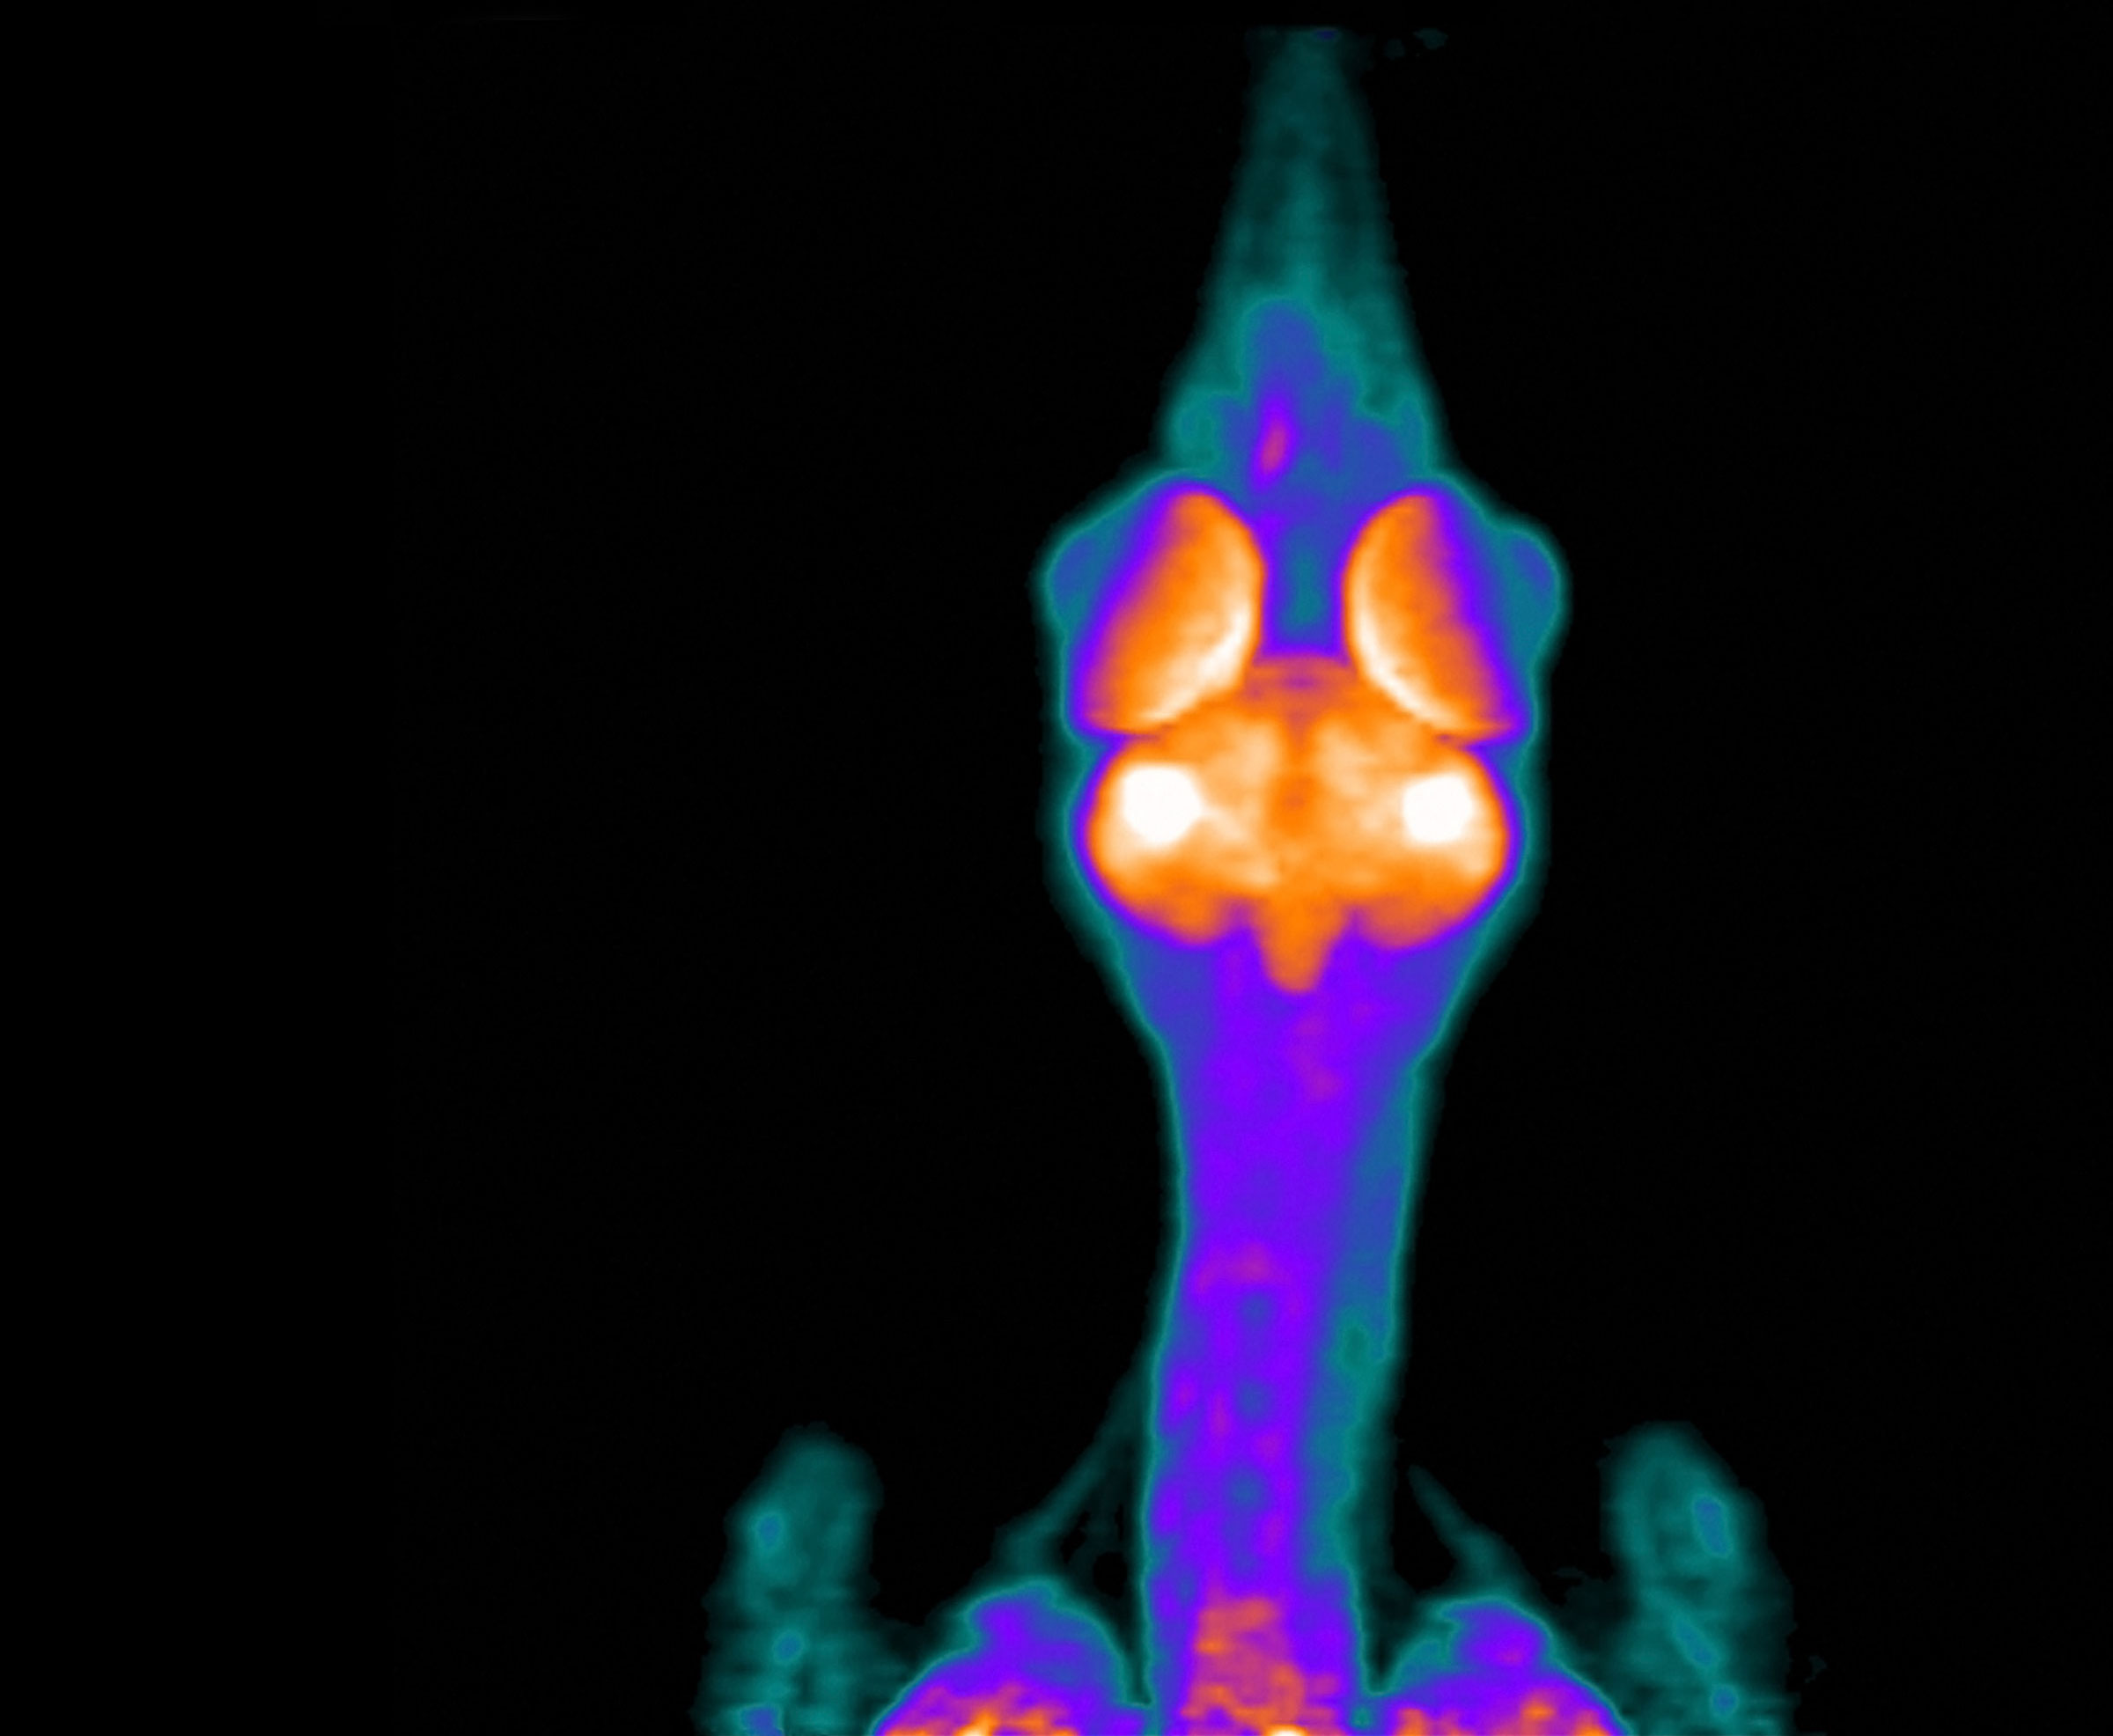 PET scan of a crow's brain: Courtesy of Robert Miyaoka/Dept. of Radiology/University of Washington